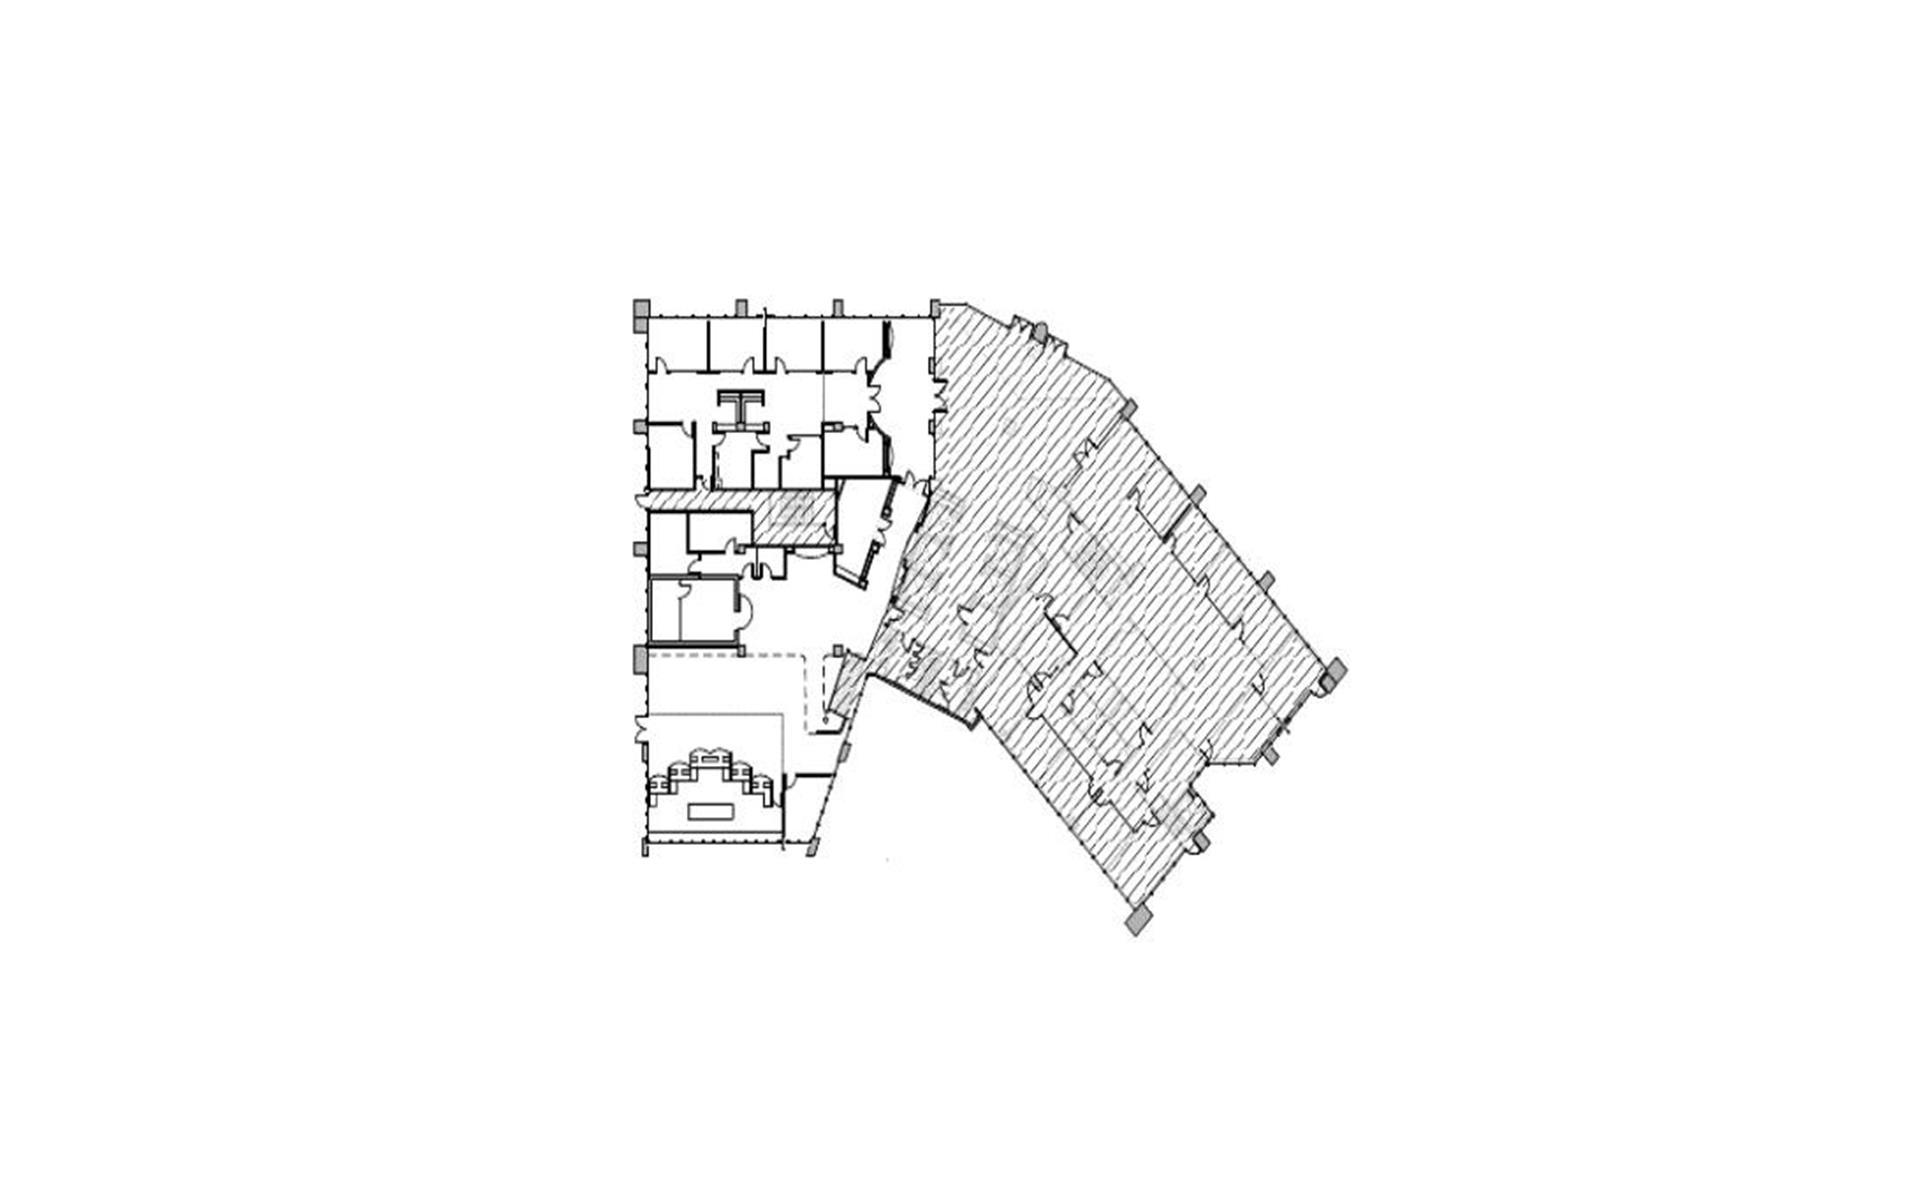 Boxer - CBIZ Plaza - Team Space | Suite 100.02